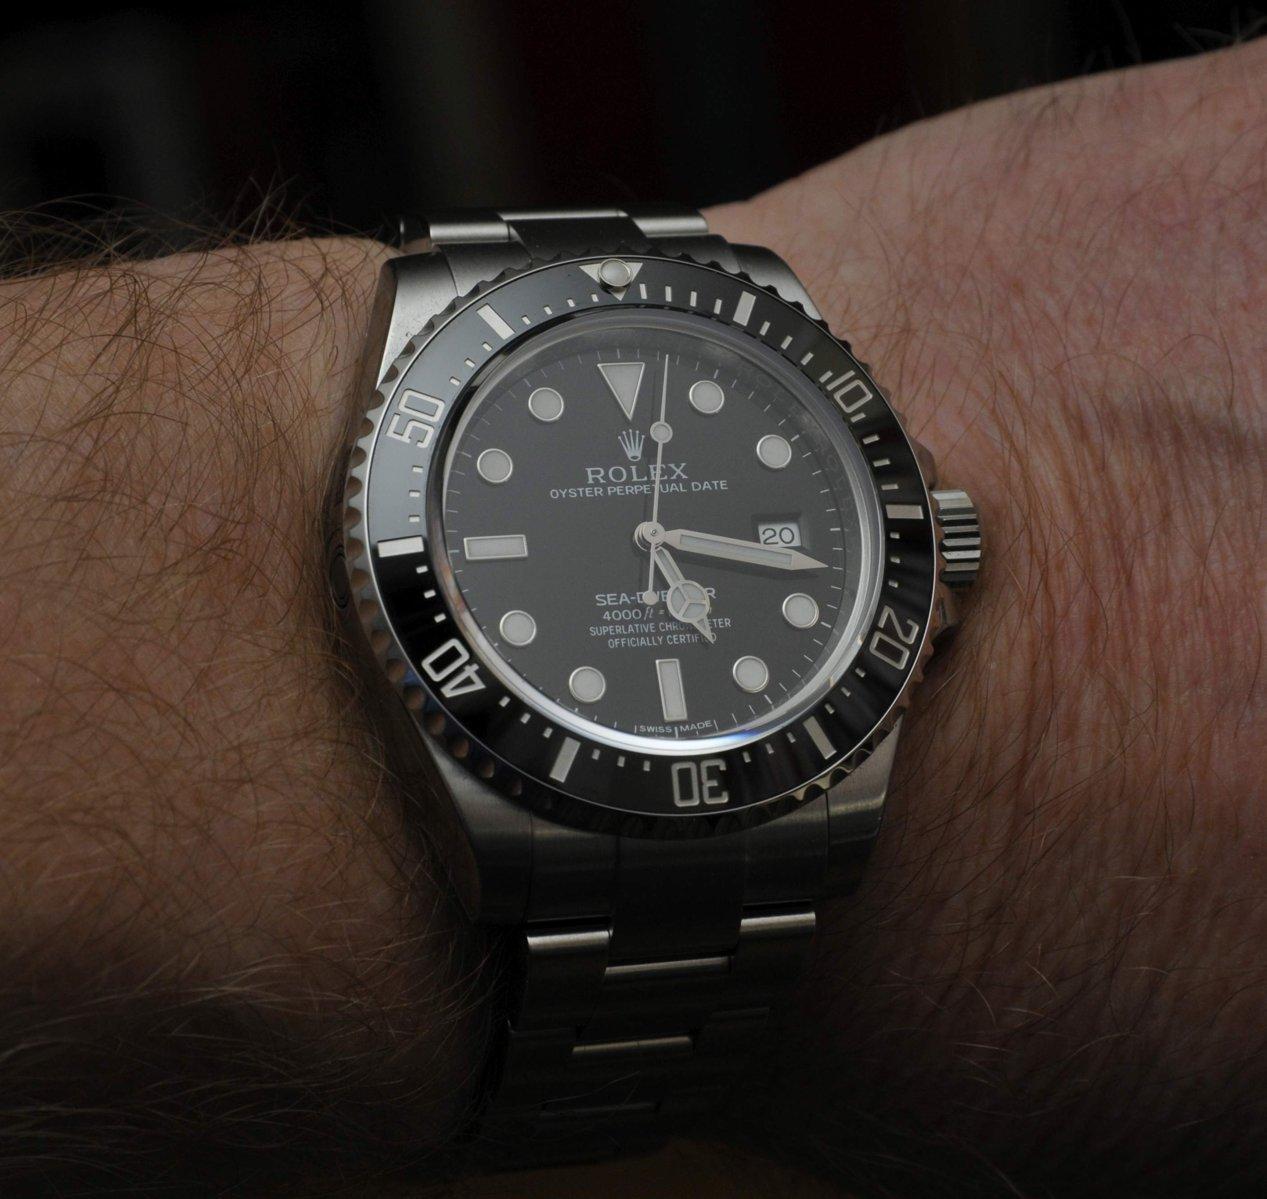 Rolex på arm 2.jpg